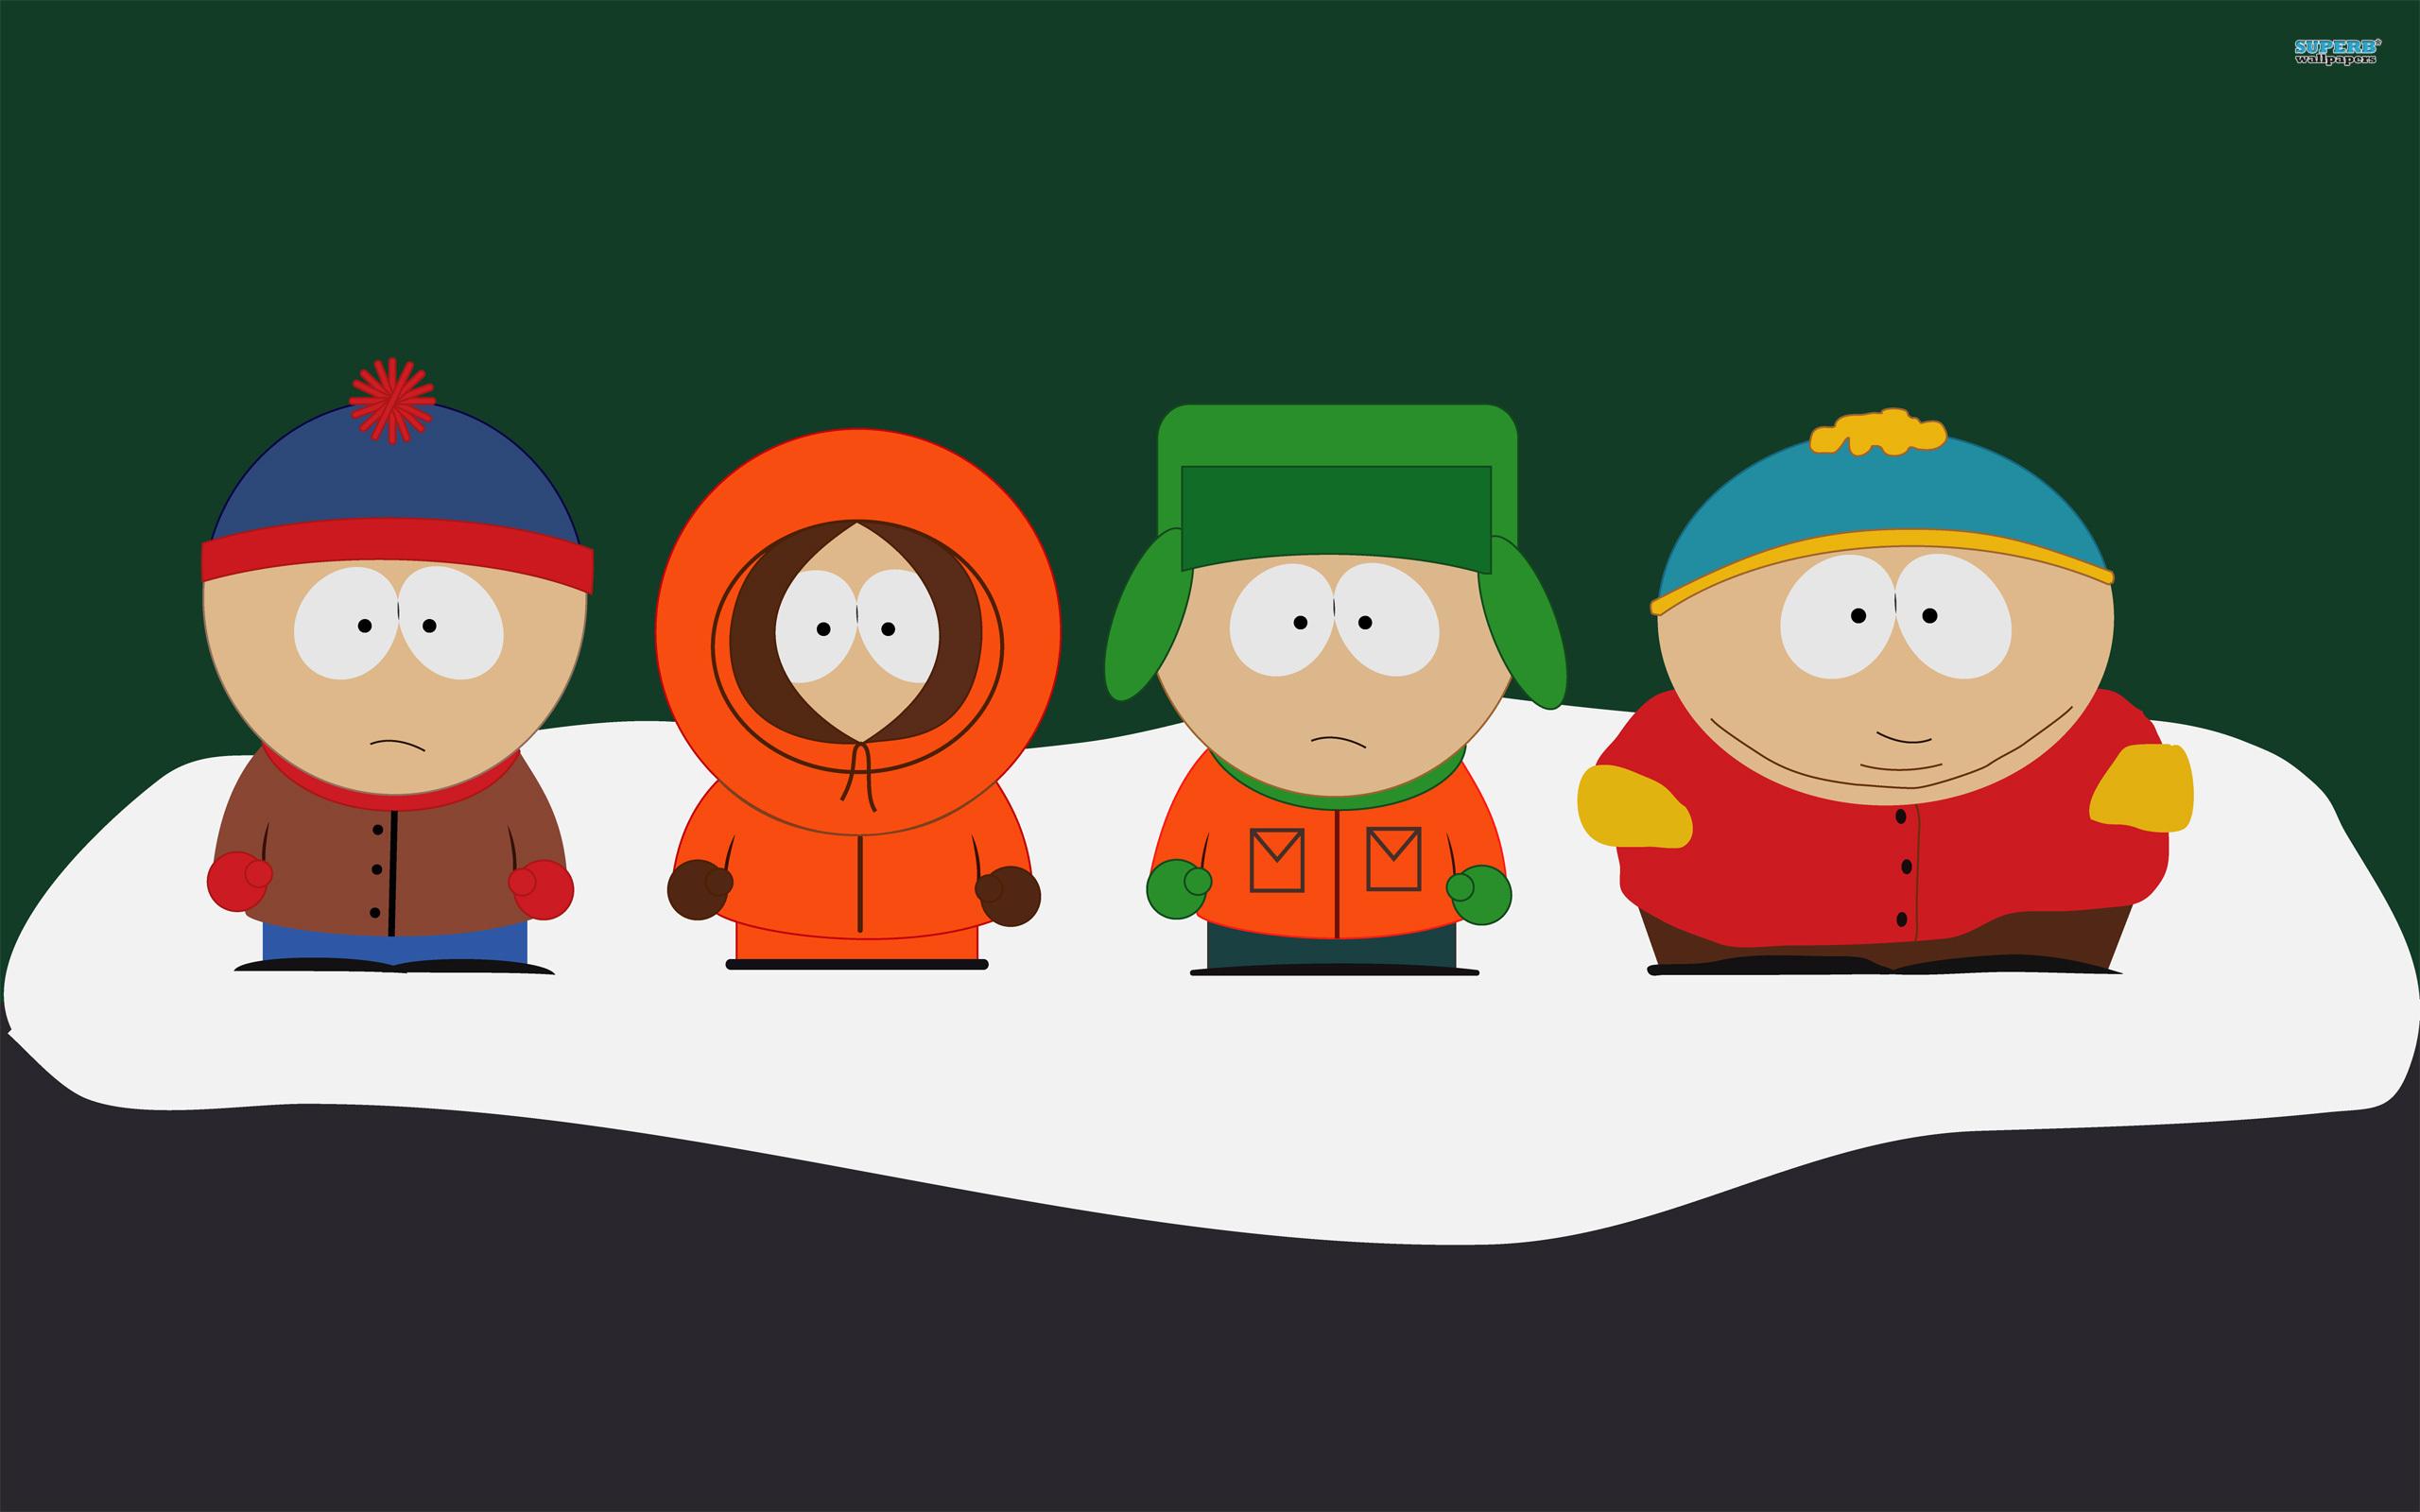 South Park wallpaper 2560x1600 jpg